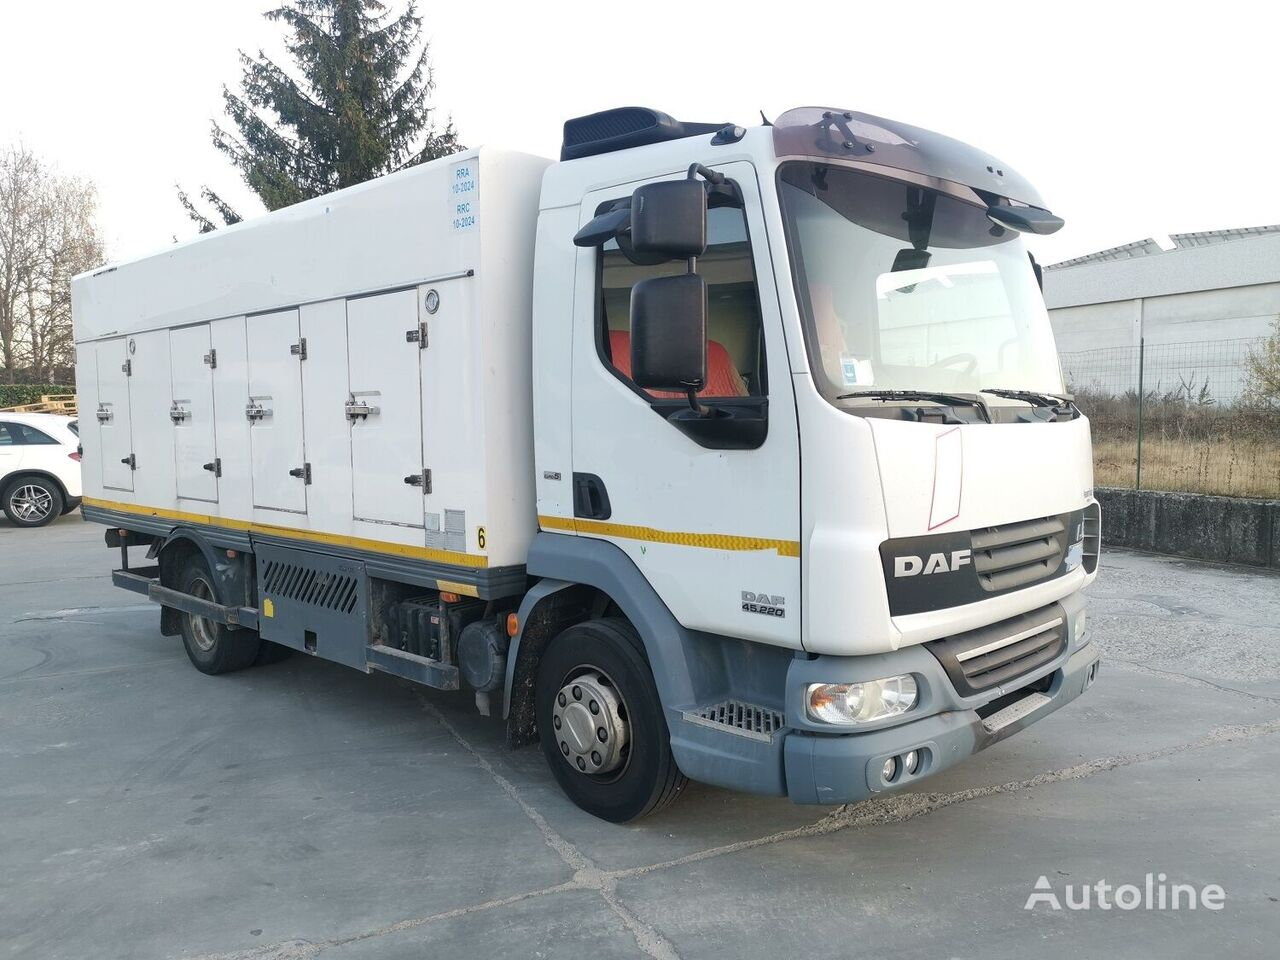 камион за сладолед DAF 45.220 SURGELATI ATP 10/2024 - 120QLI